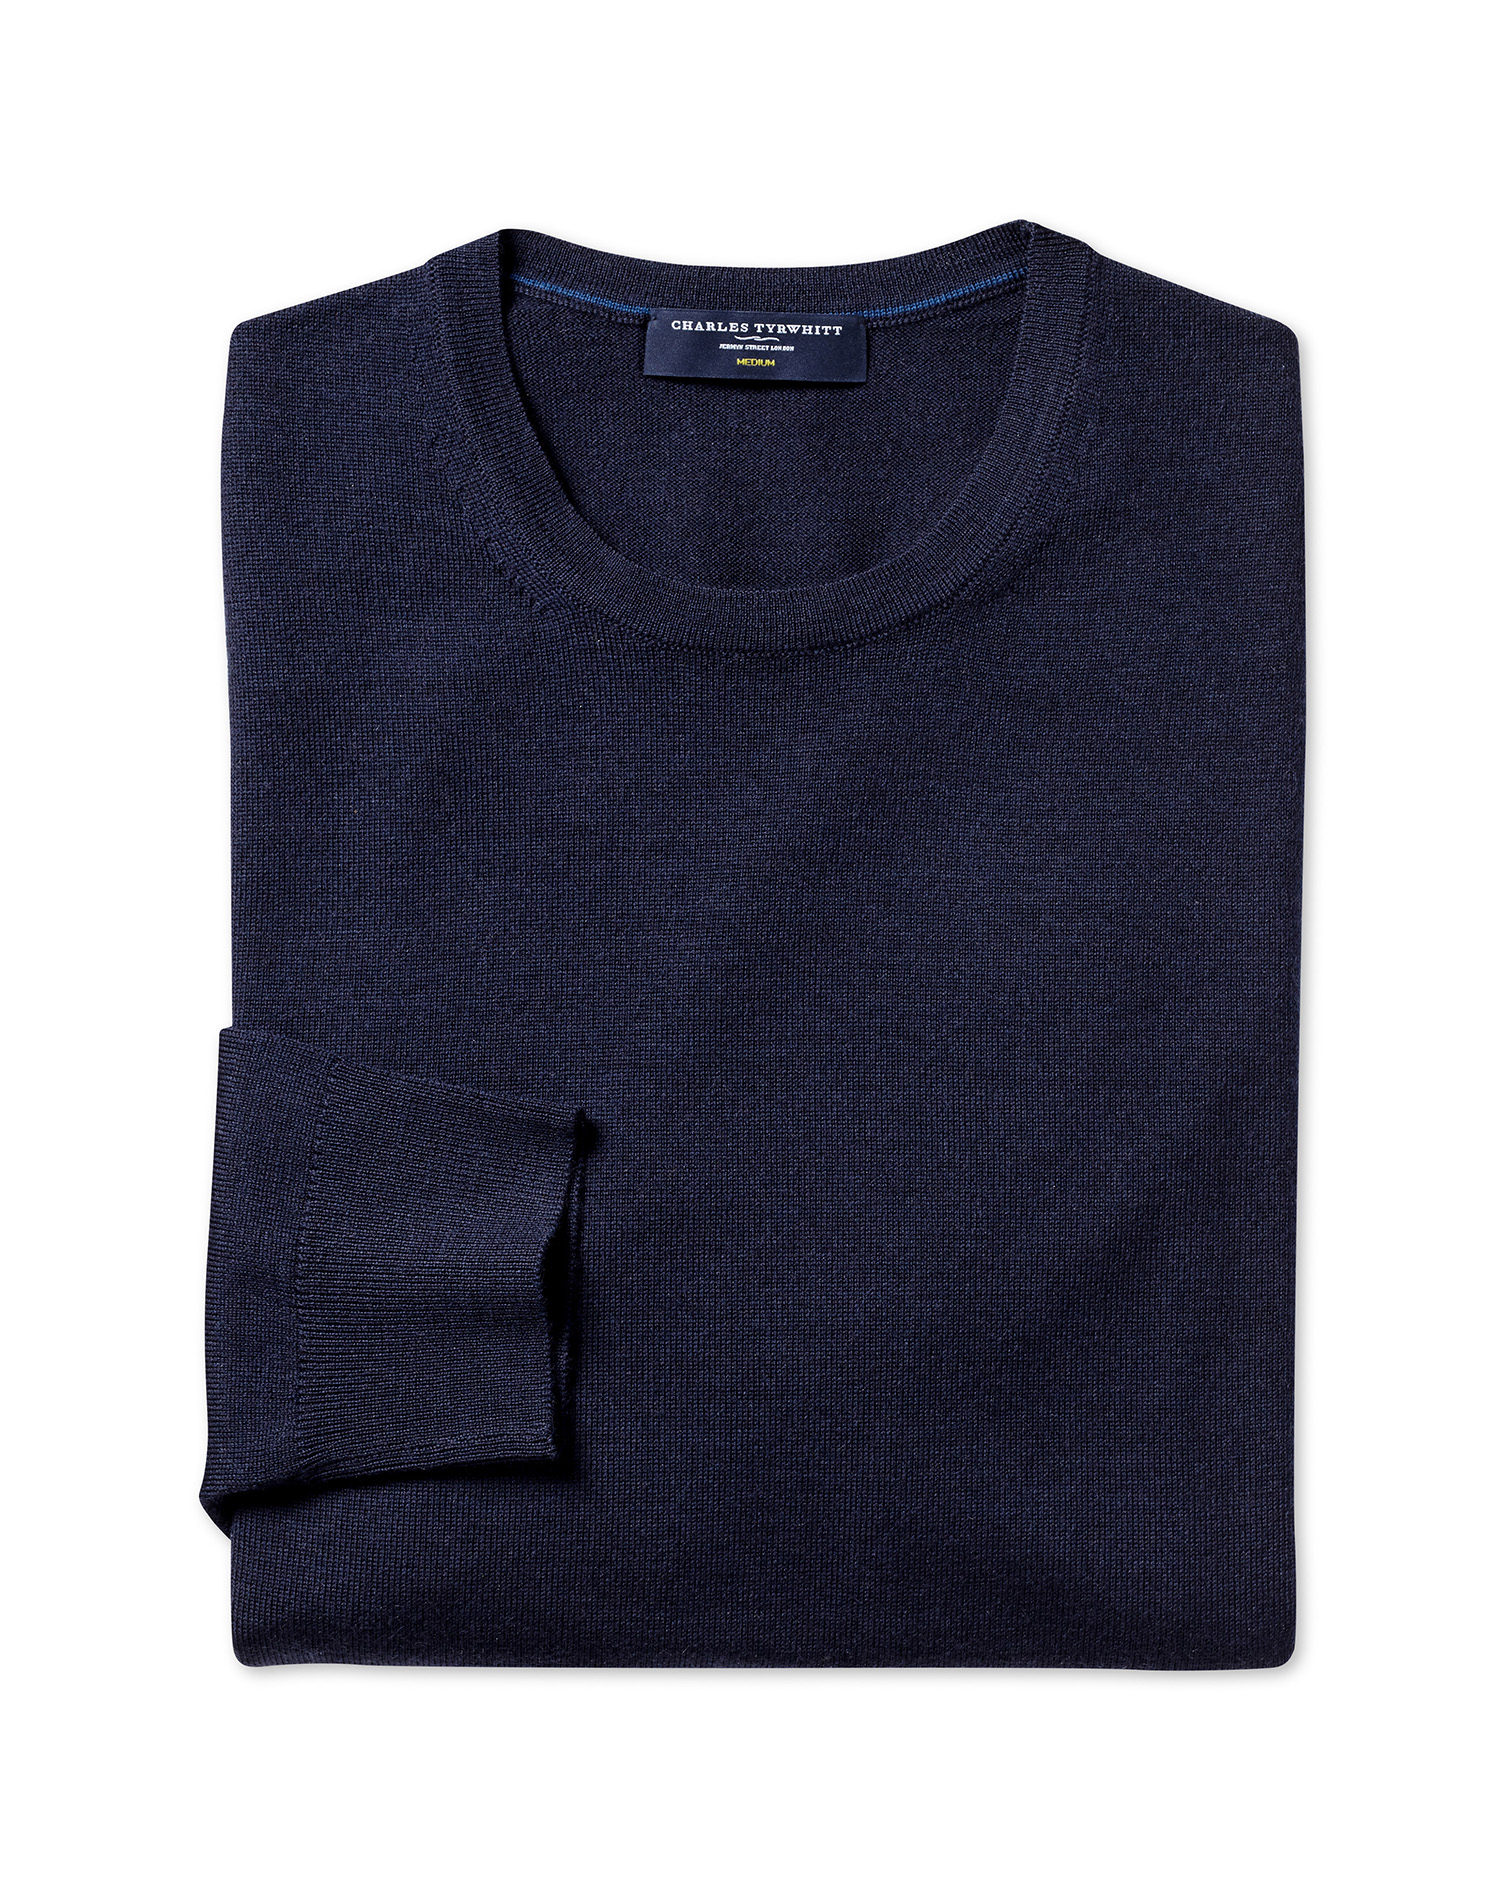 Navy Merino Wool Crew Neck Jumper Size XL by Charles Tyrwhitt